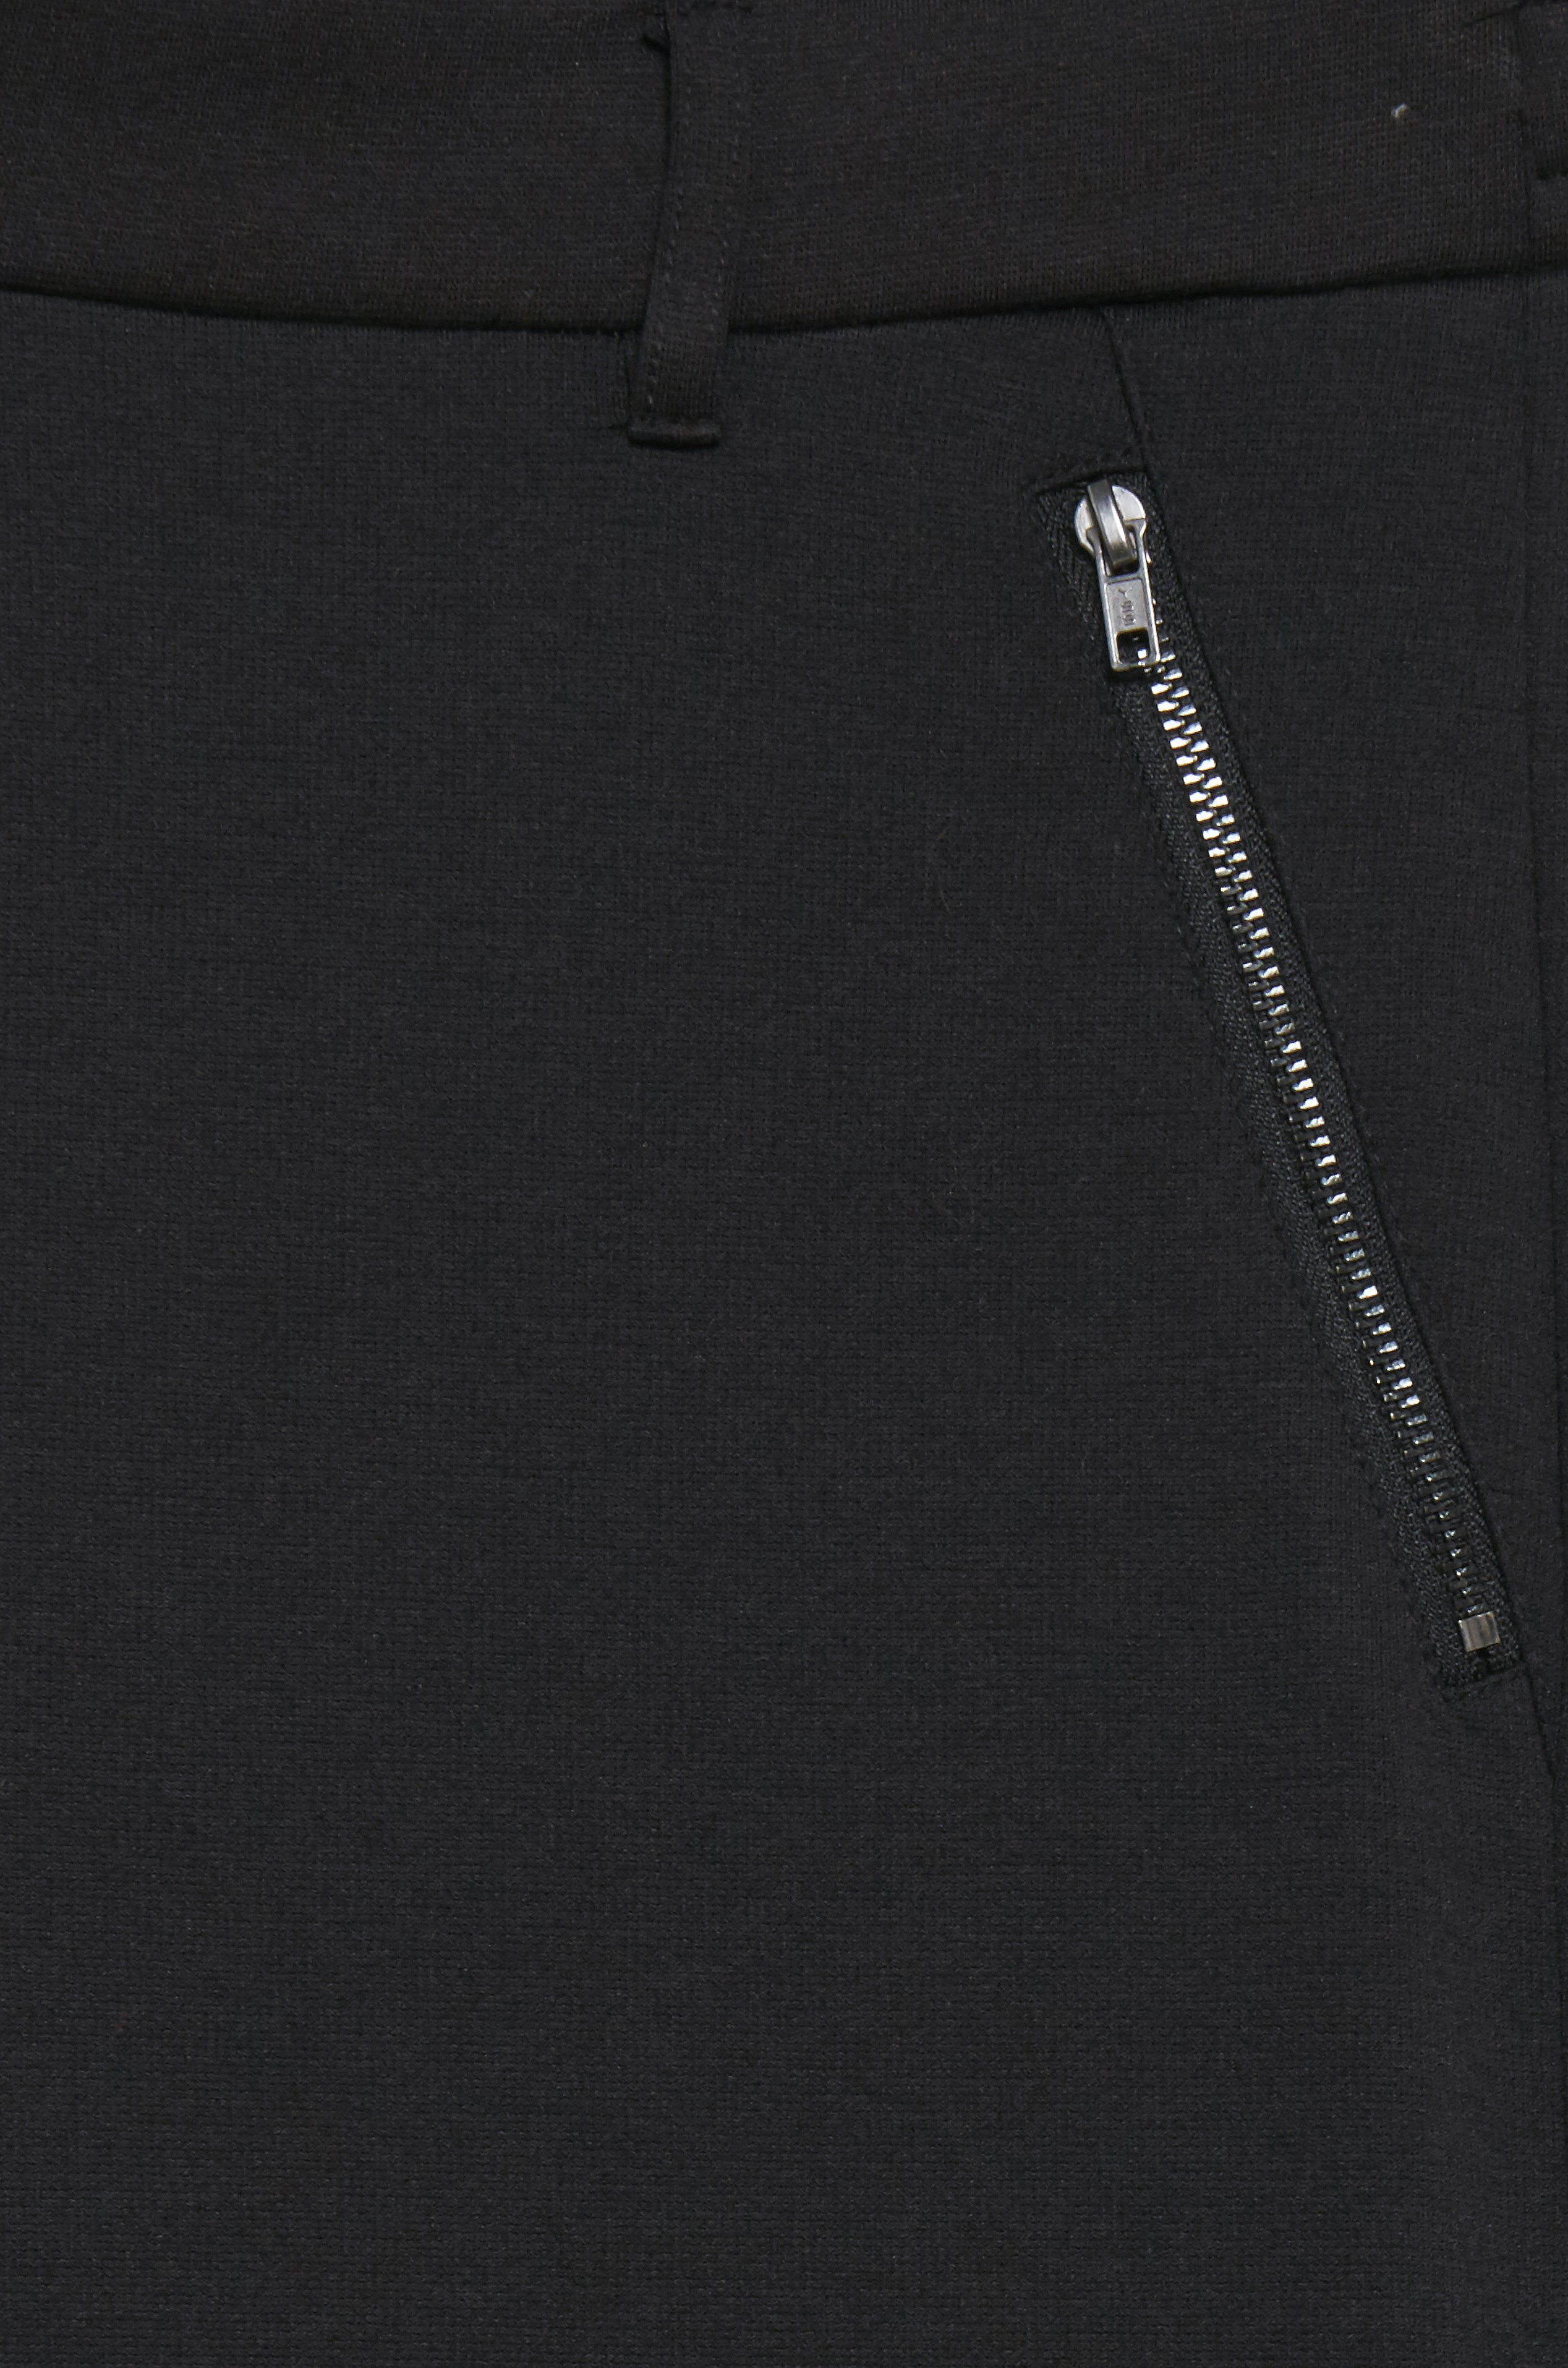 Black Bukser i blød jersey med lynlås - cropped længde  – Køb Black Bukser i blød jersey med lynlås - cropped længde  fra str. XS-XXL her